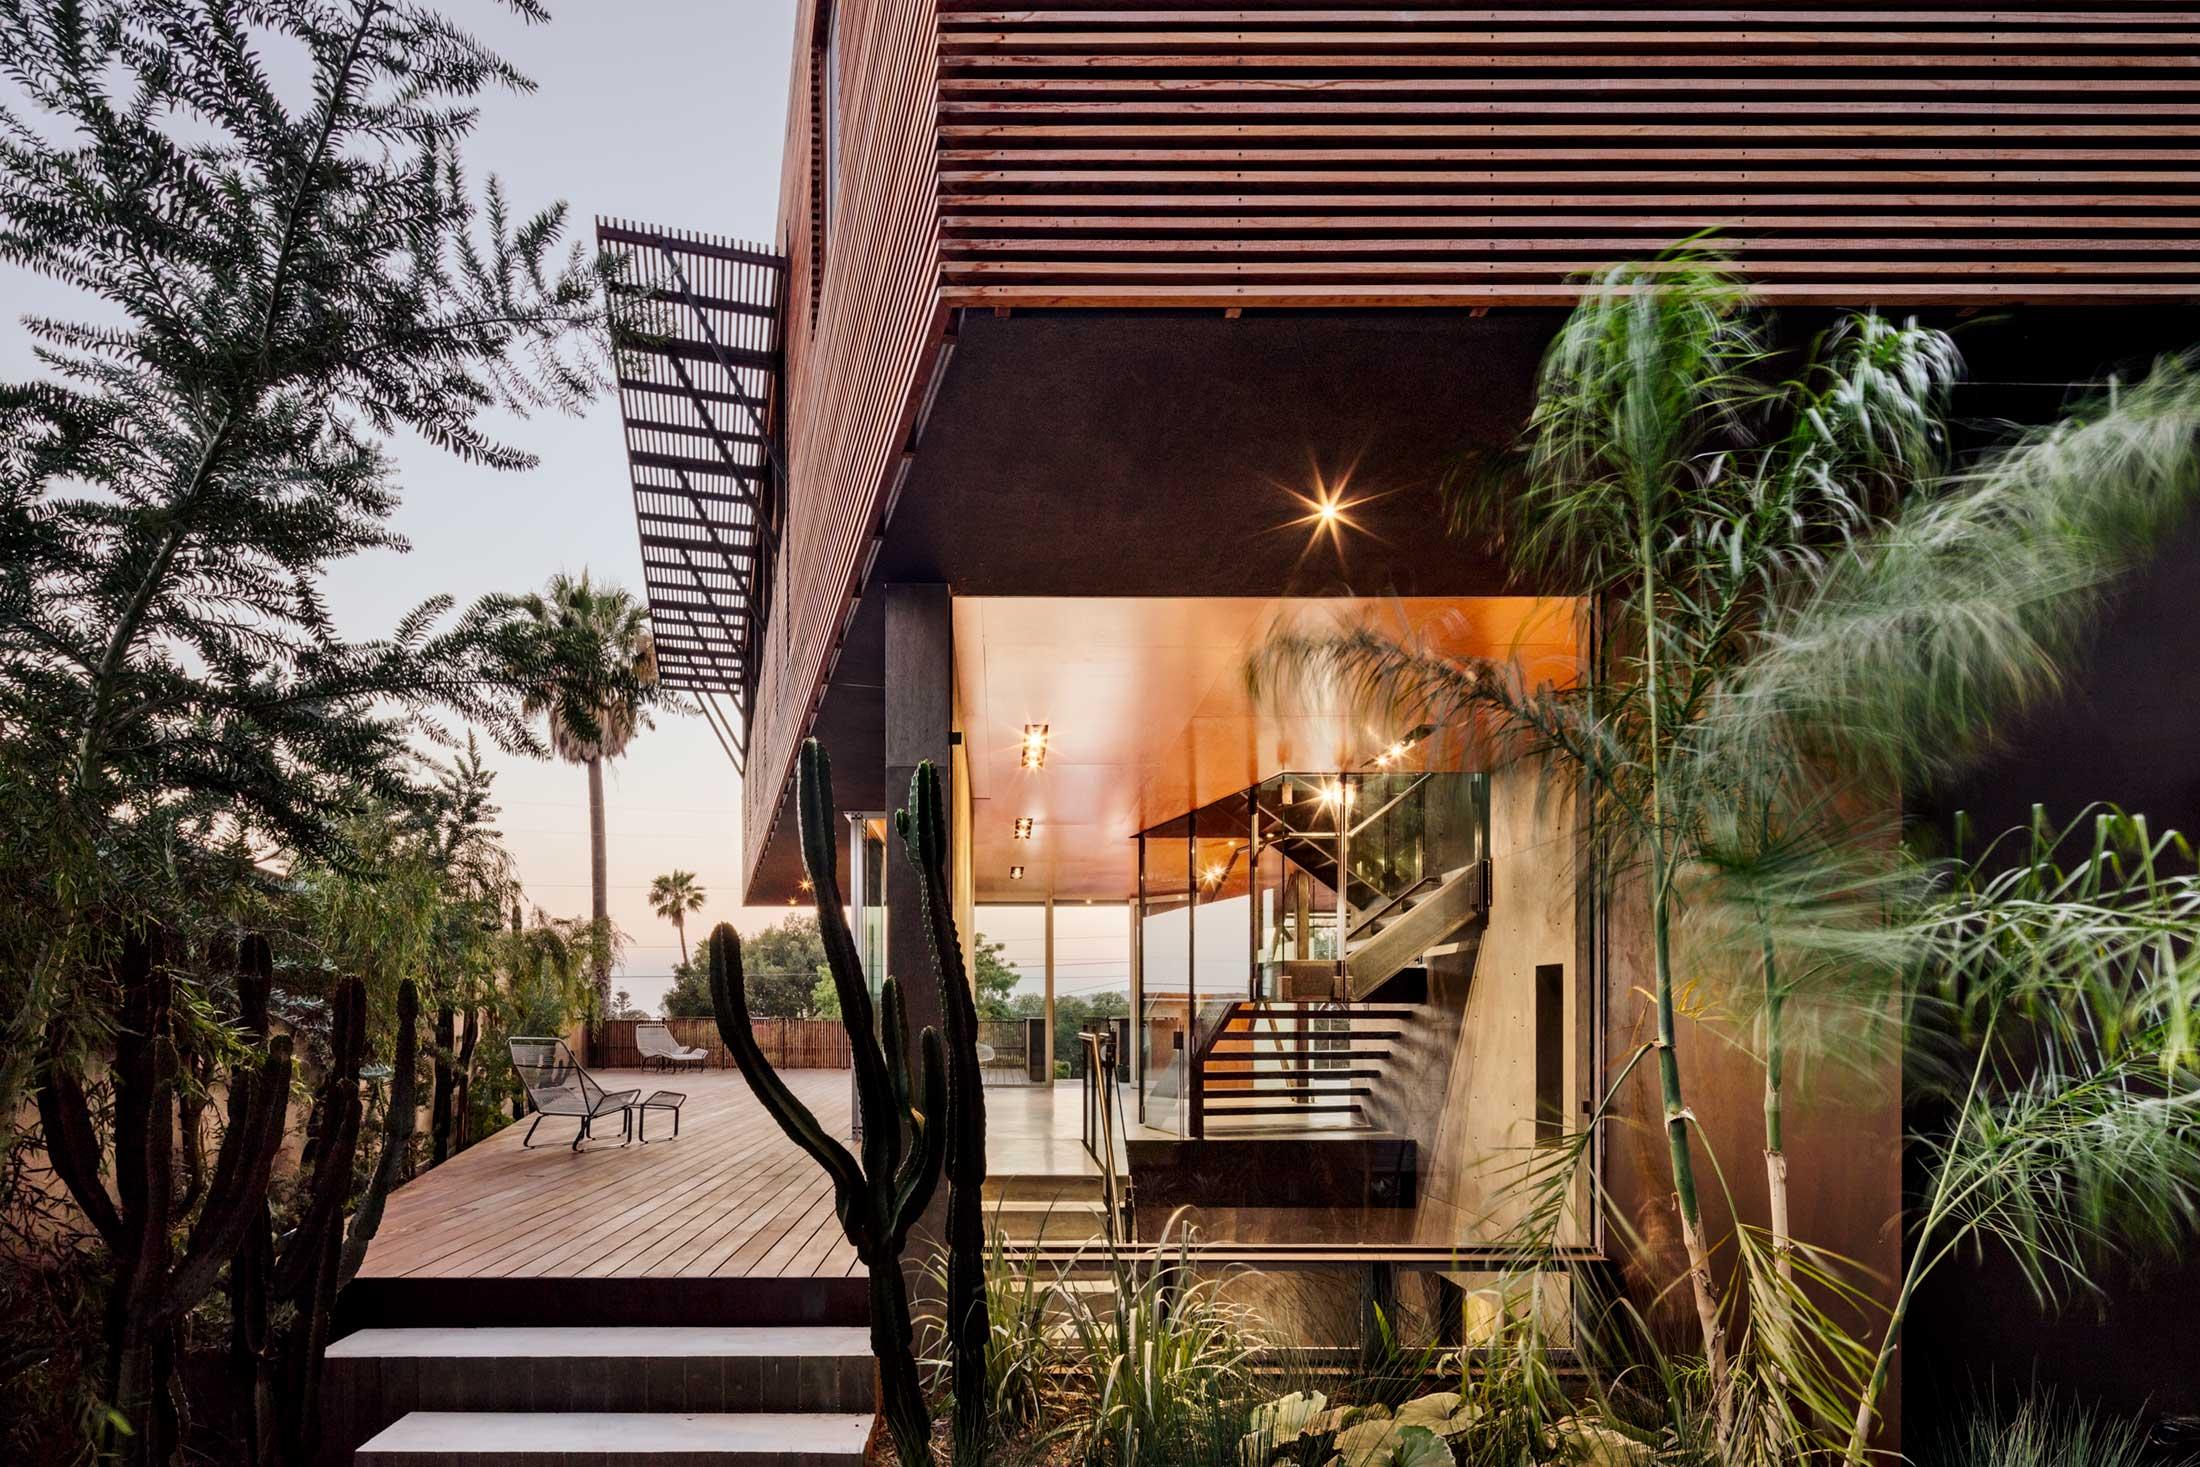 modern-architecture-residential-garden-california-shubindonaldson-skyline-2